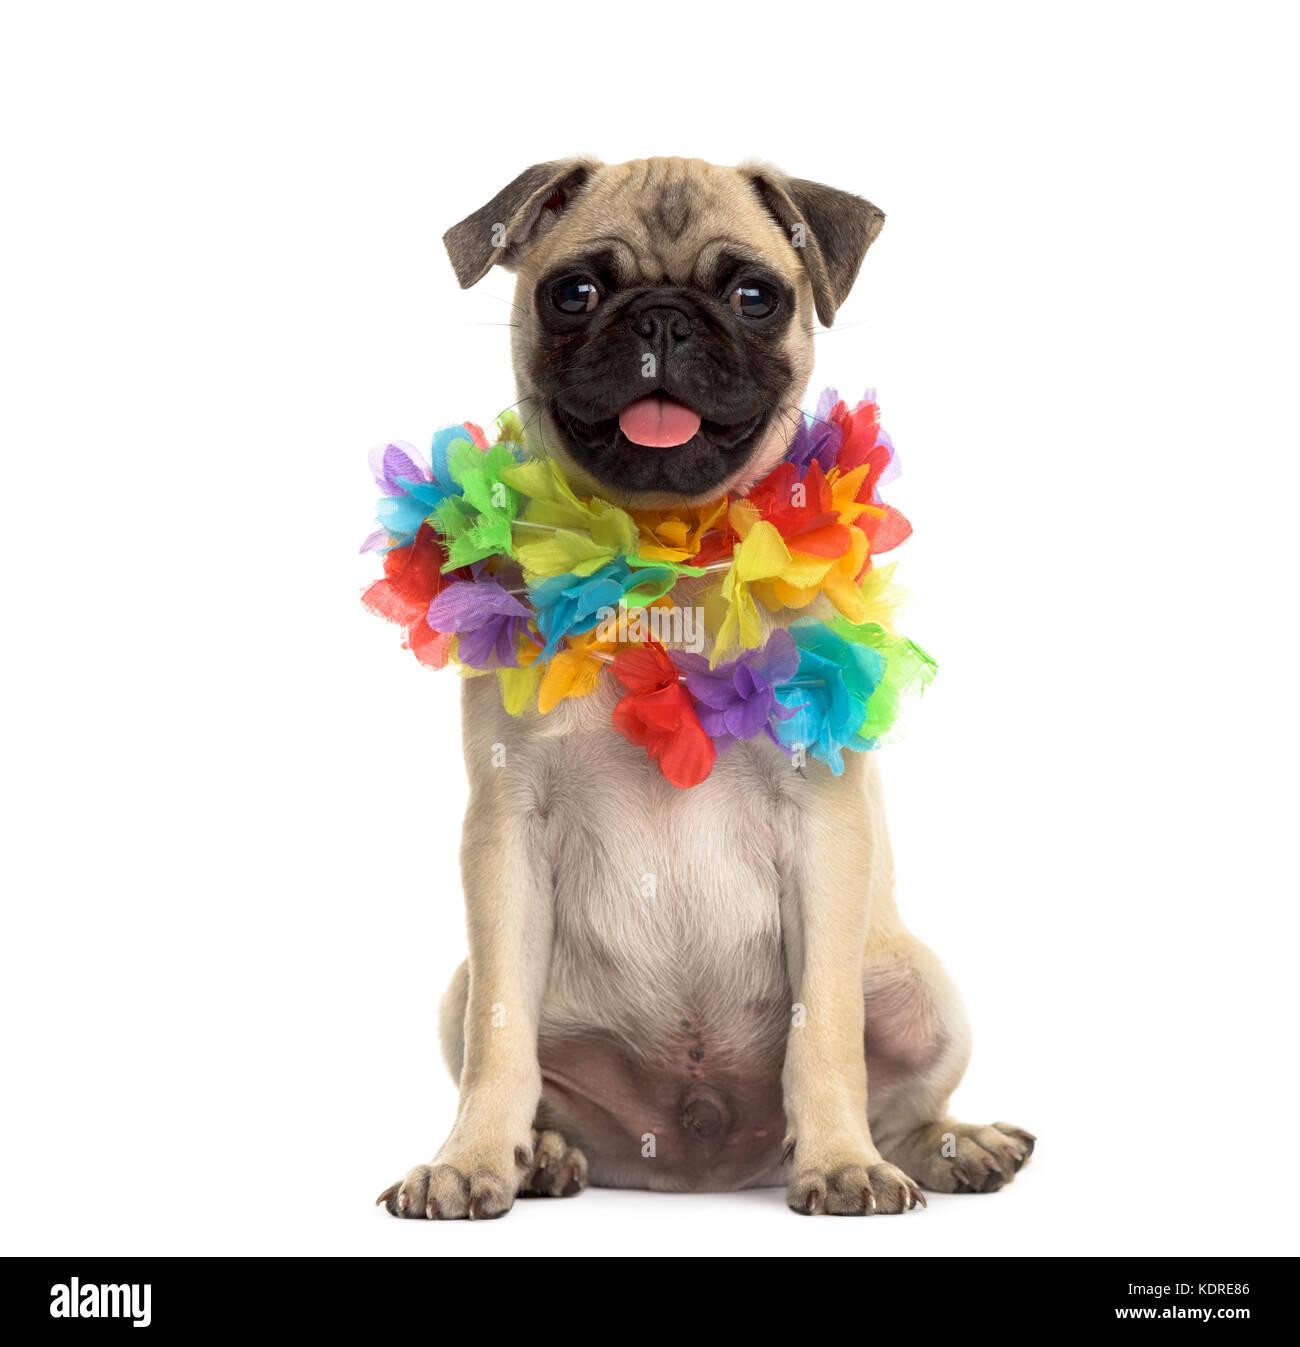 Pug sitting wearing a hawaiian lei, isolated on white - Stock Image